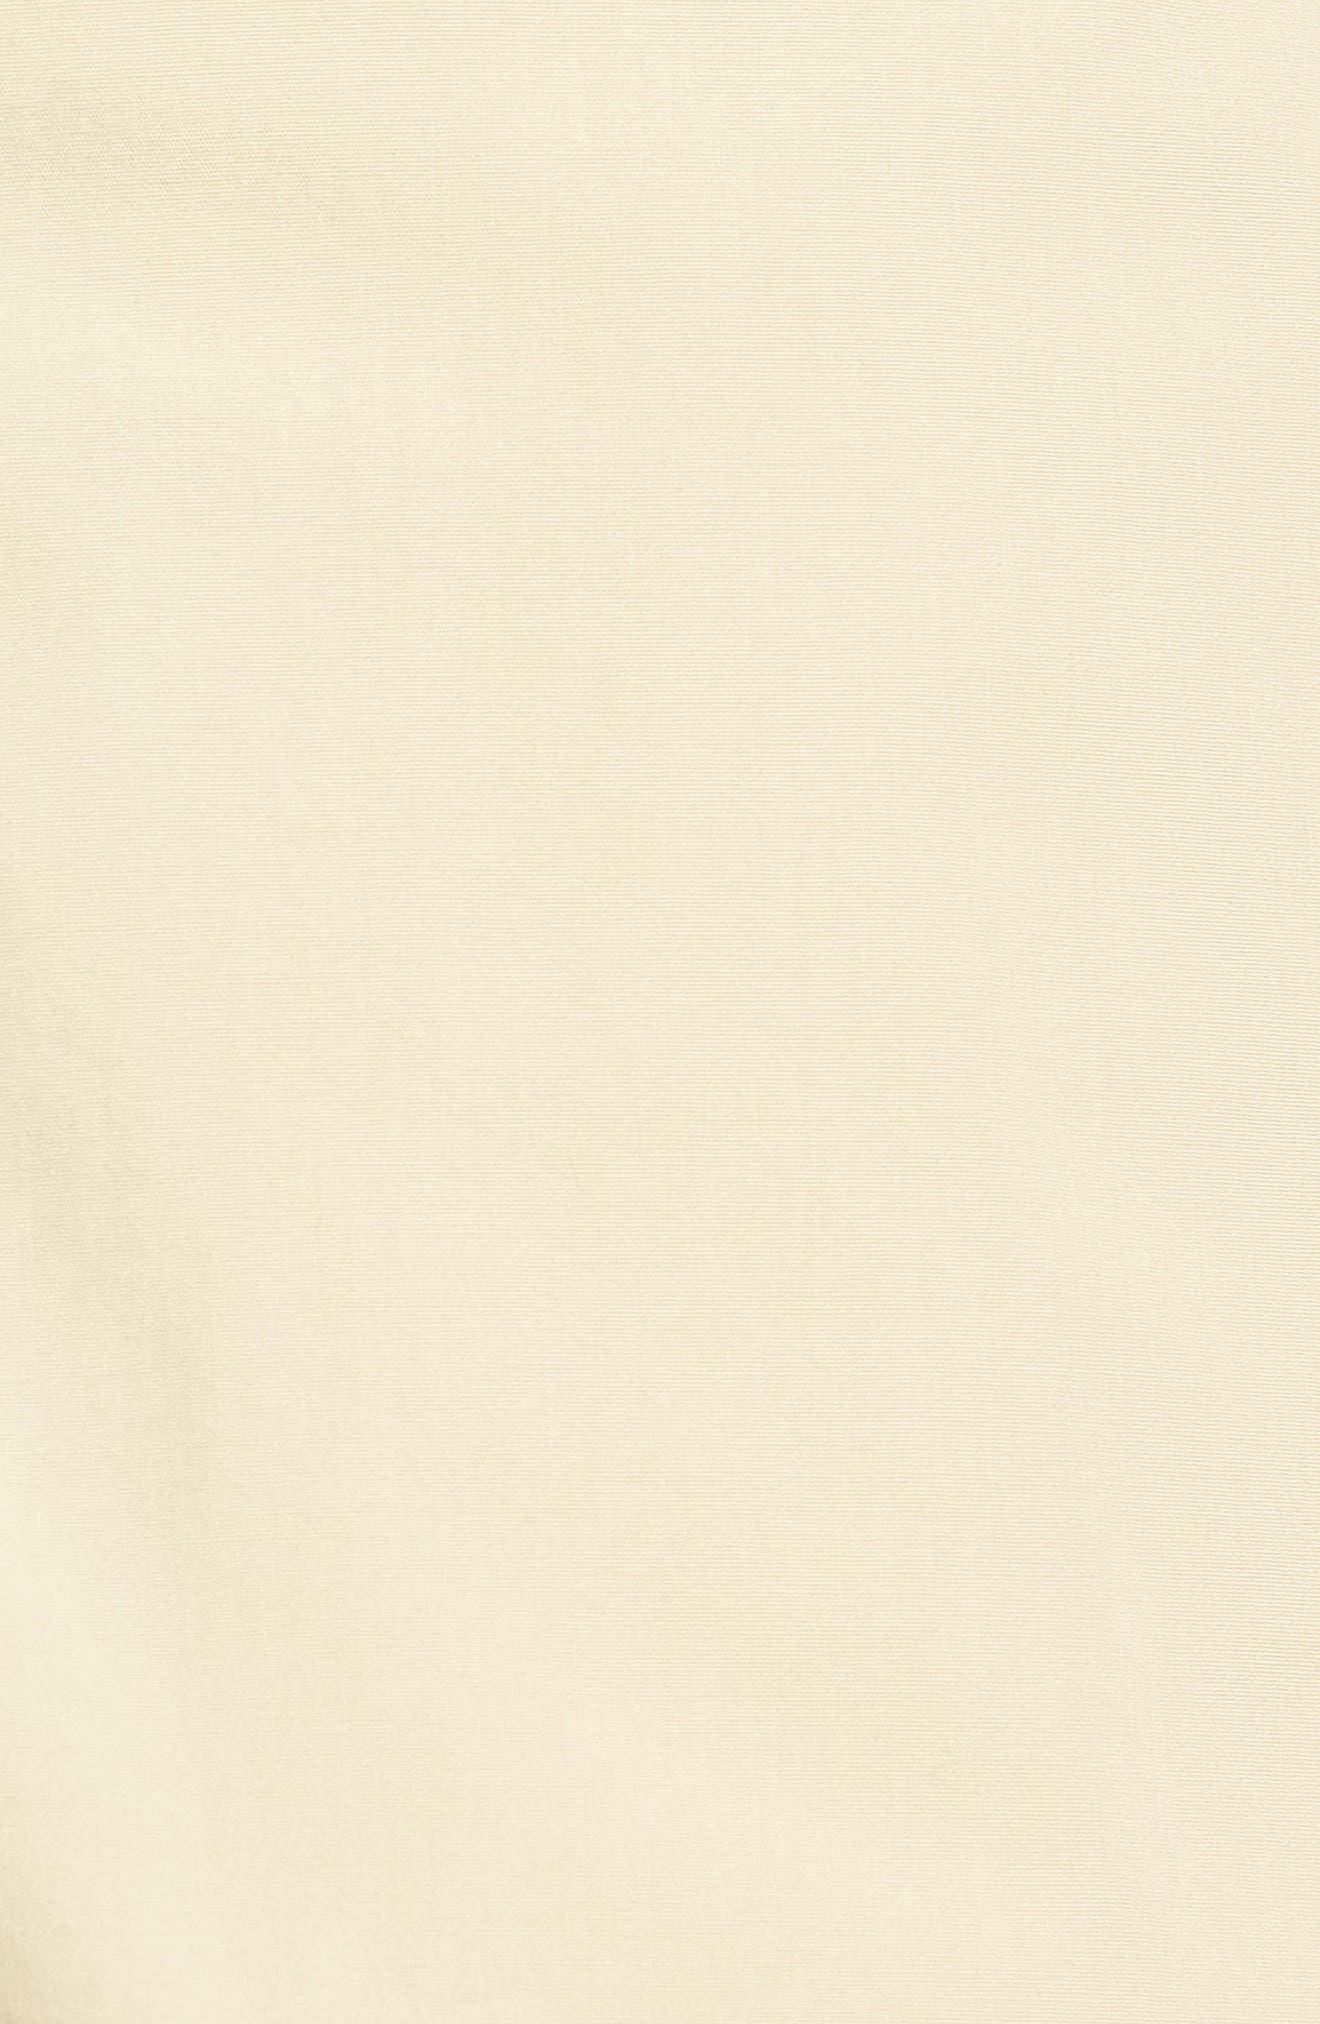 M2 Classic Fit Flat Front Tropical Cotton Poplin Shorts,                             Alternate thumbnail 5, color,                             Khaki